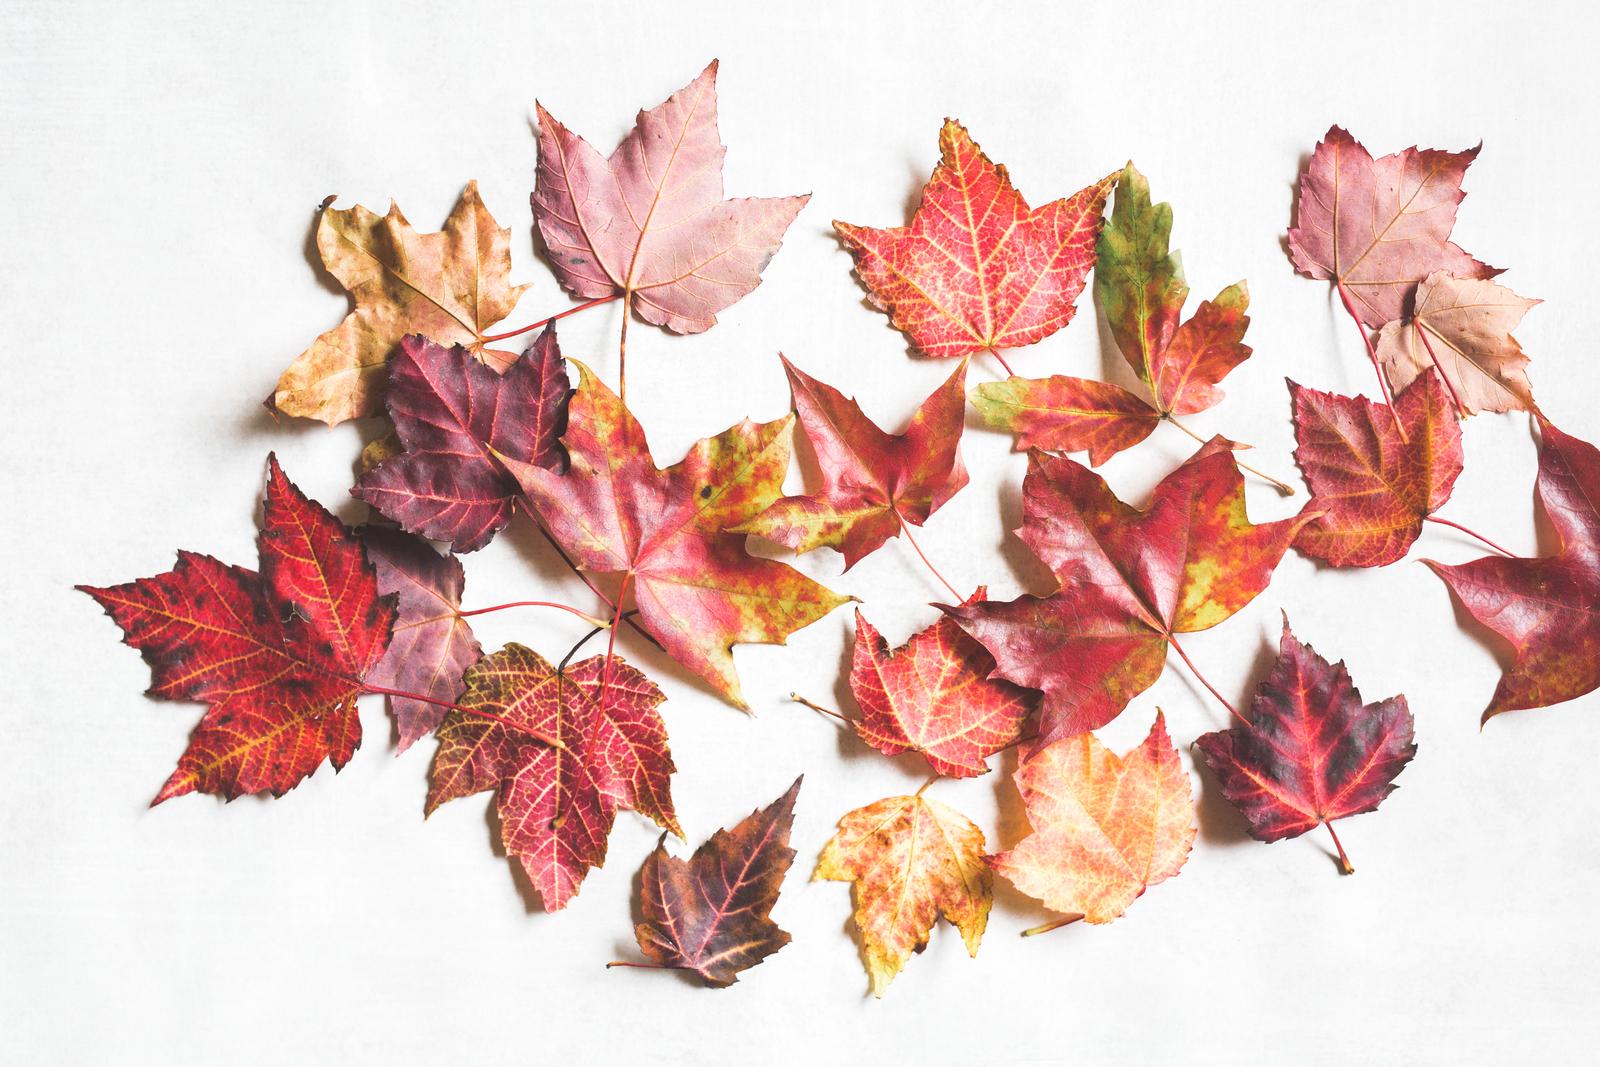 Red_Autumn_Leaves-201.jpg